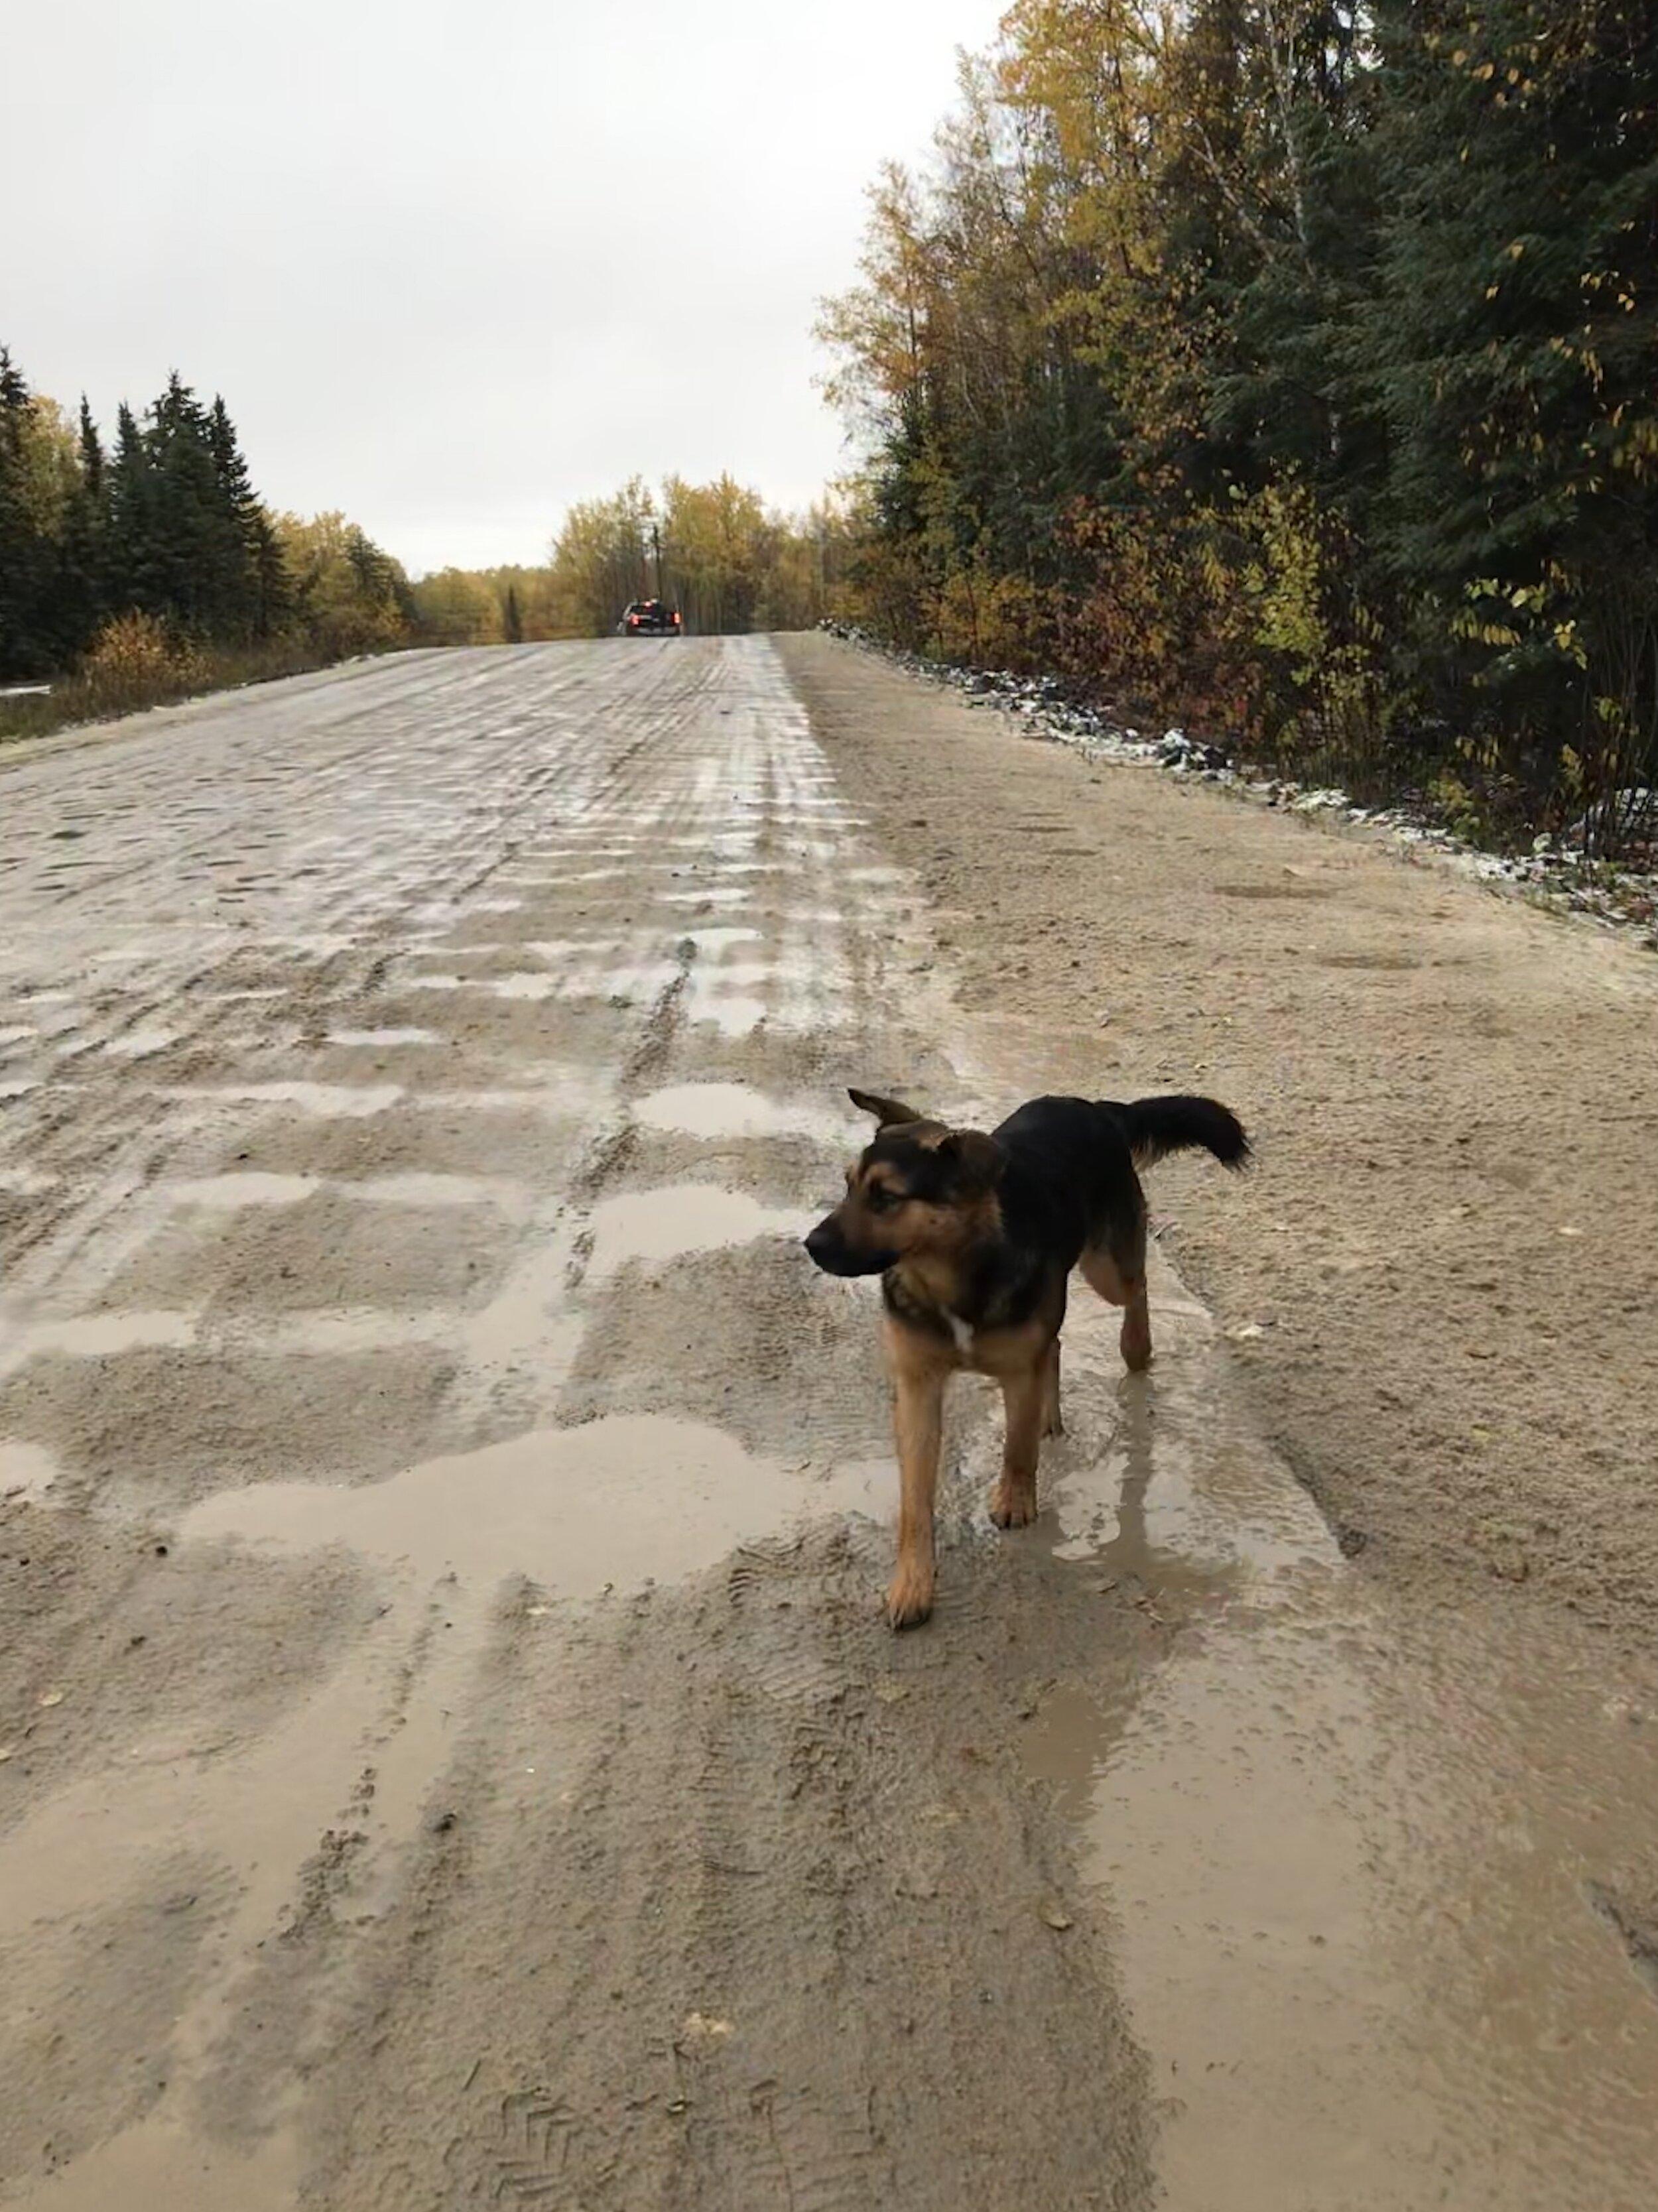 Dog on road!